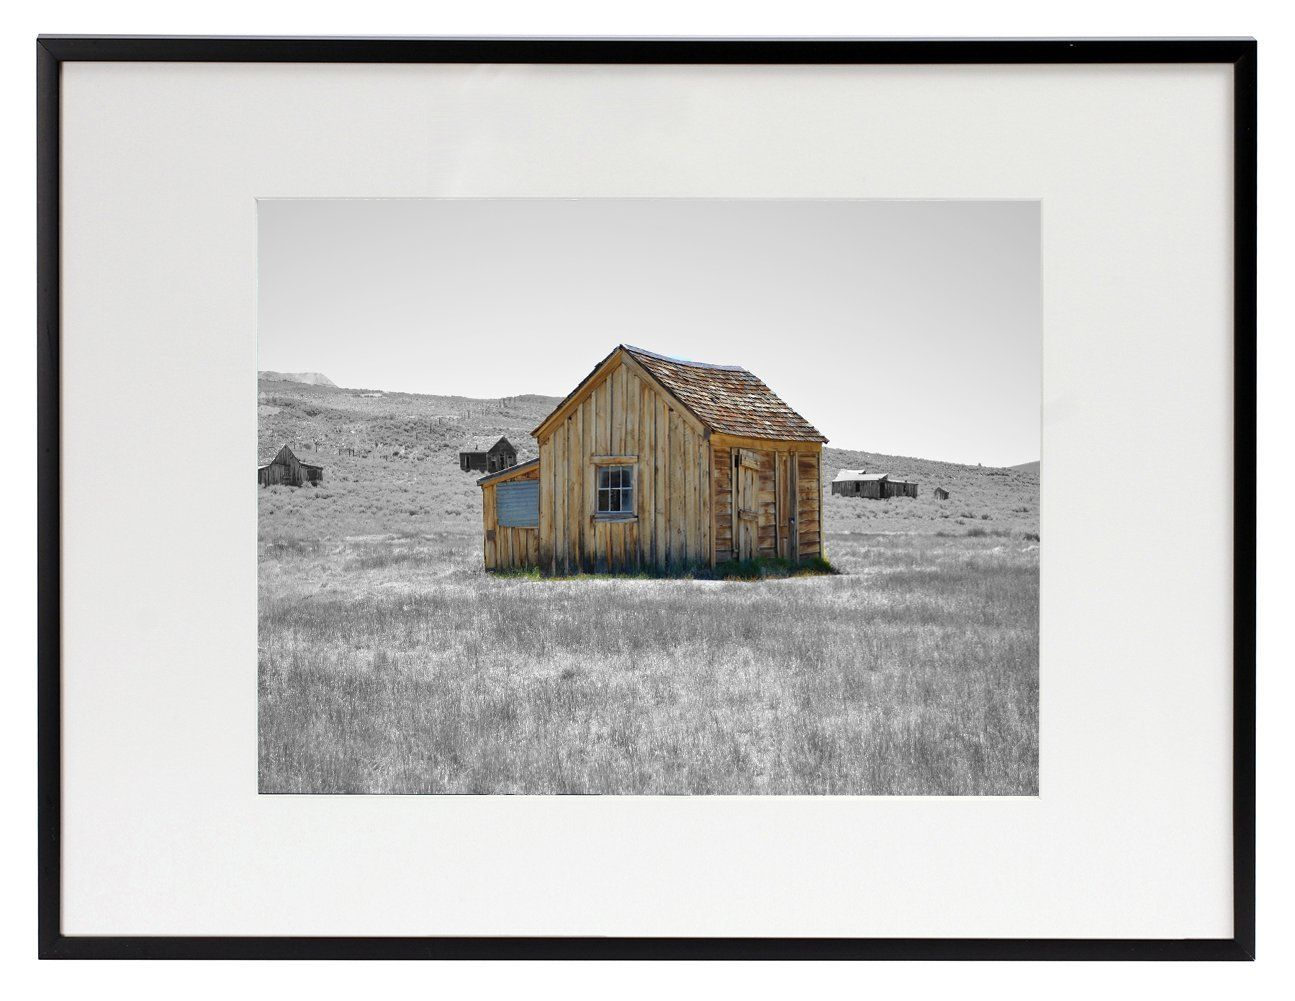 Frametory 12x16 Aluminum Matte Black Photo Frame With Ivory Color